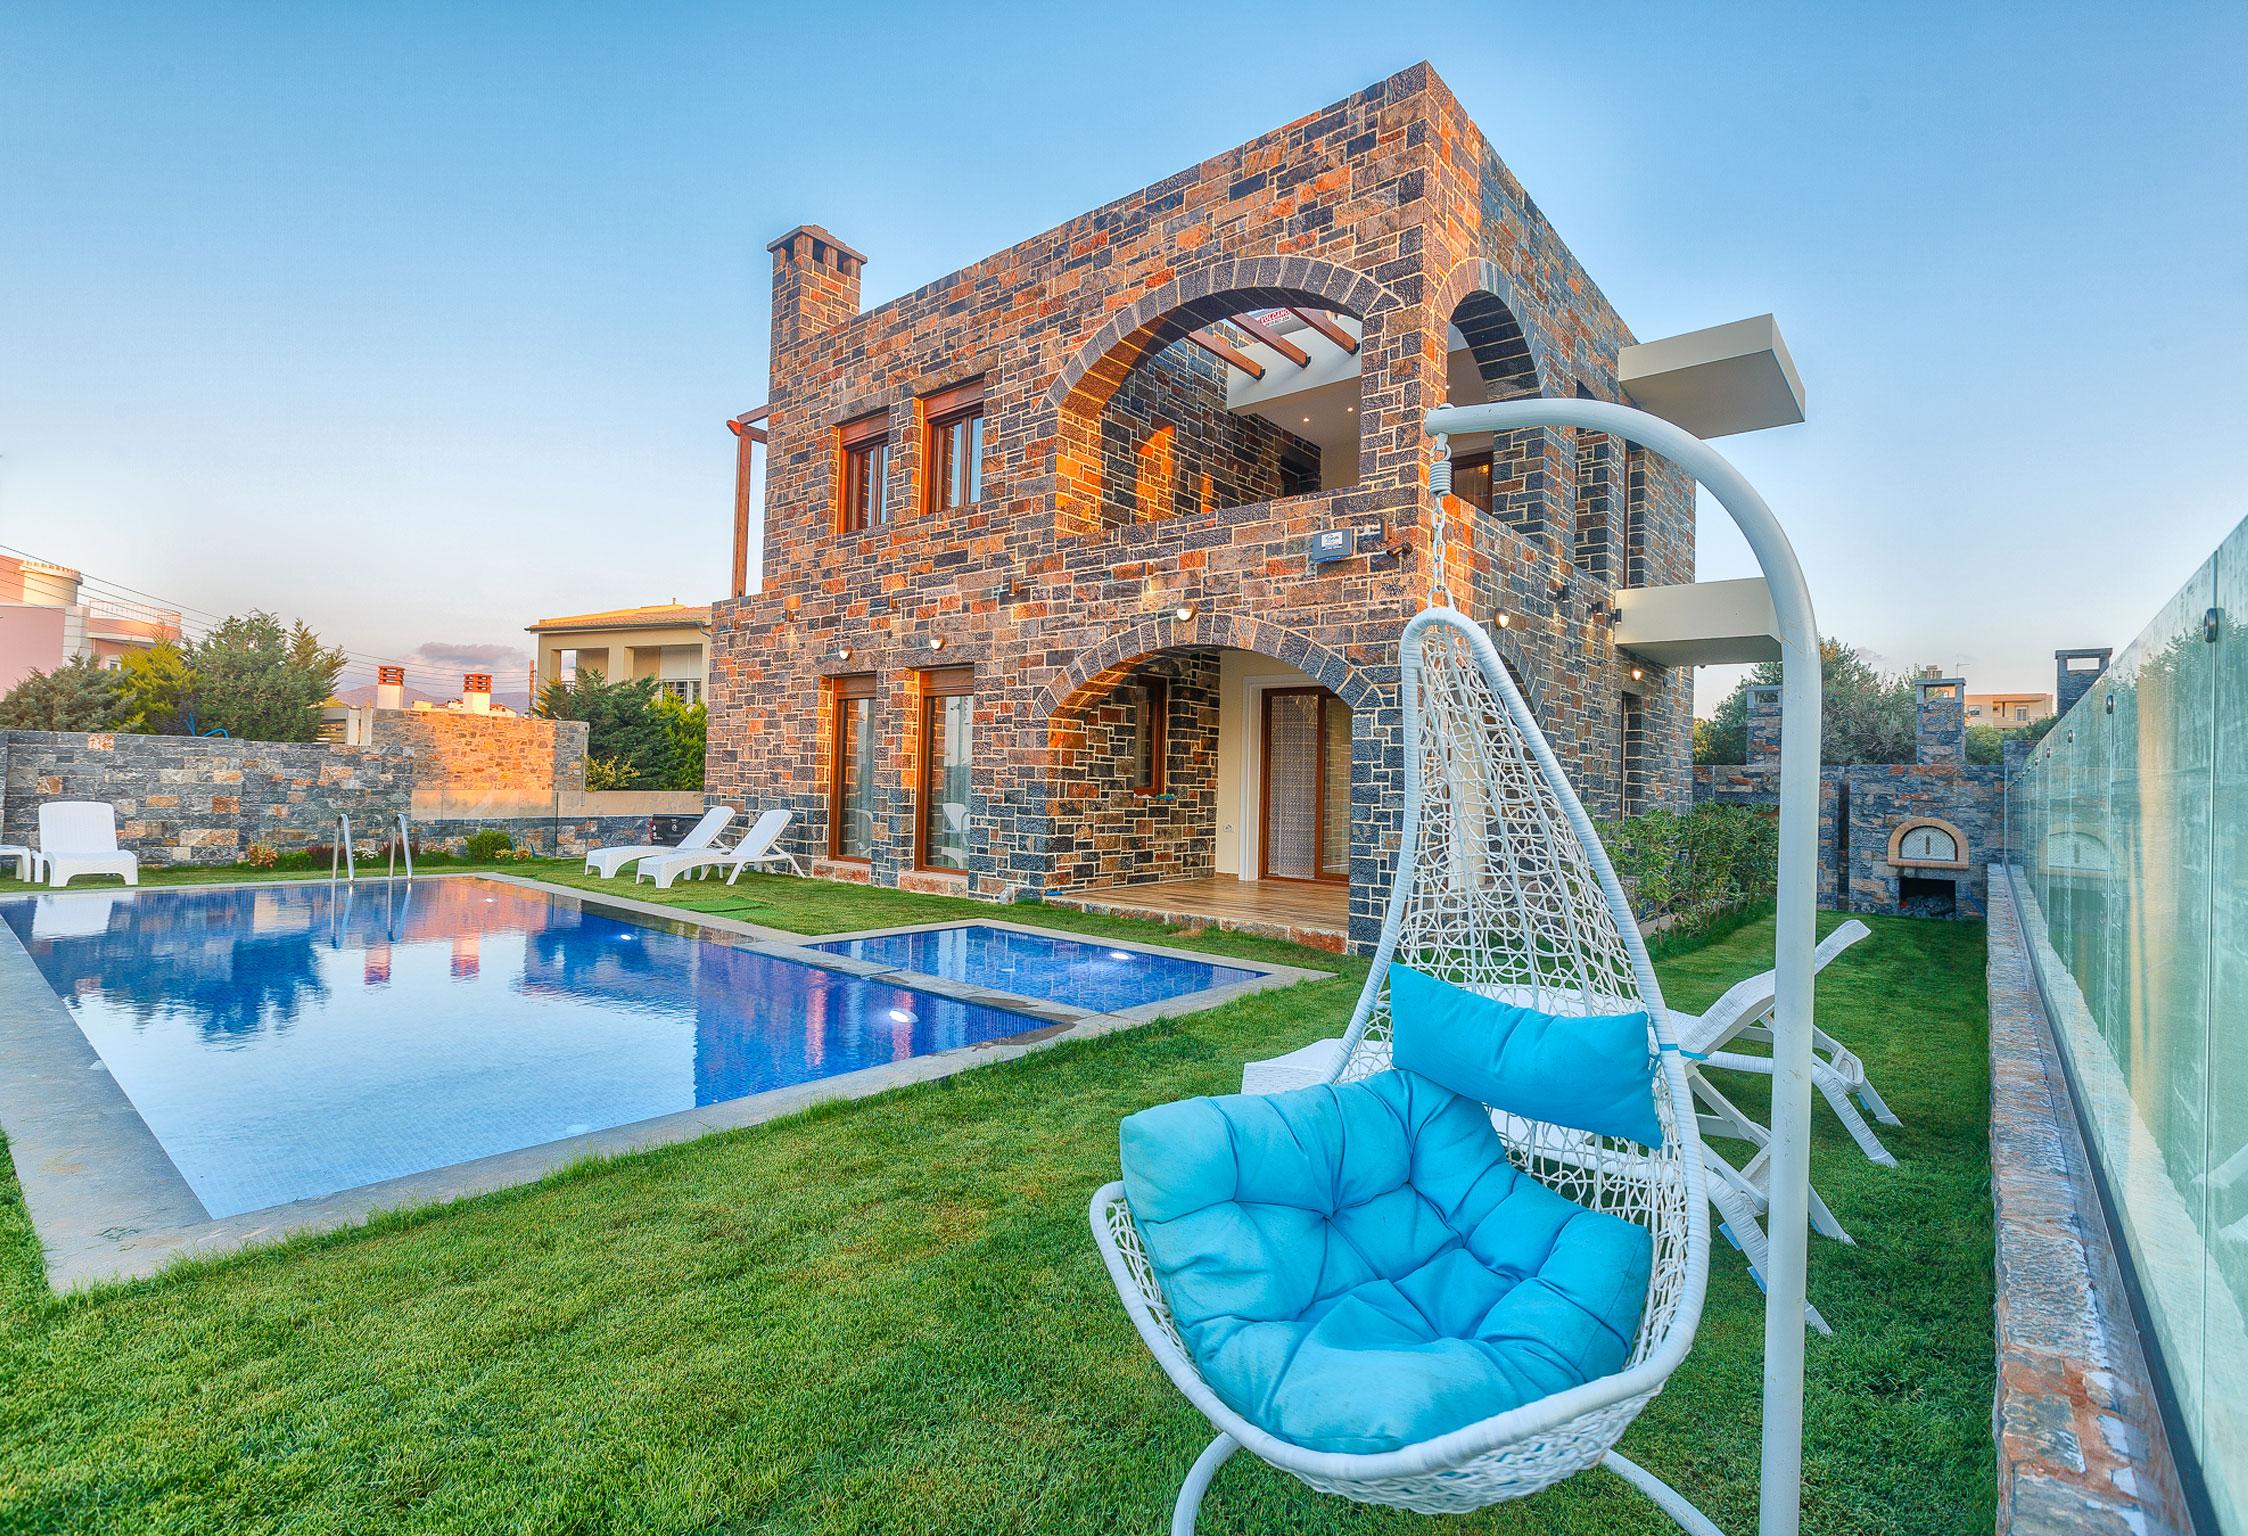 Crete Villa Genesis II jumbotron image